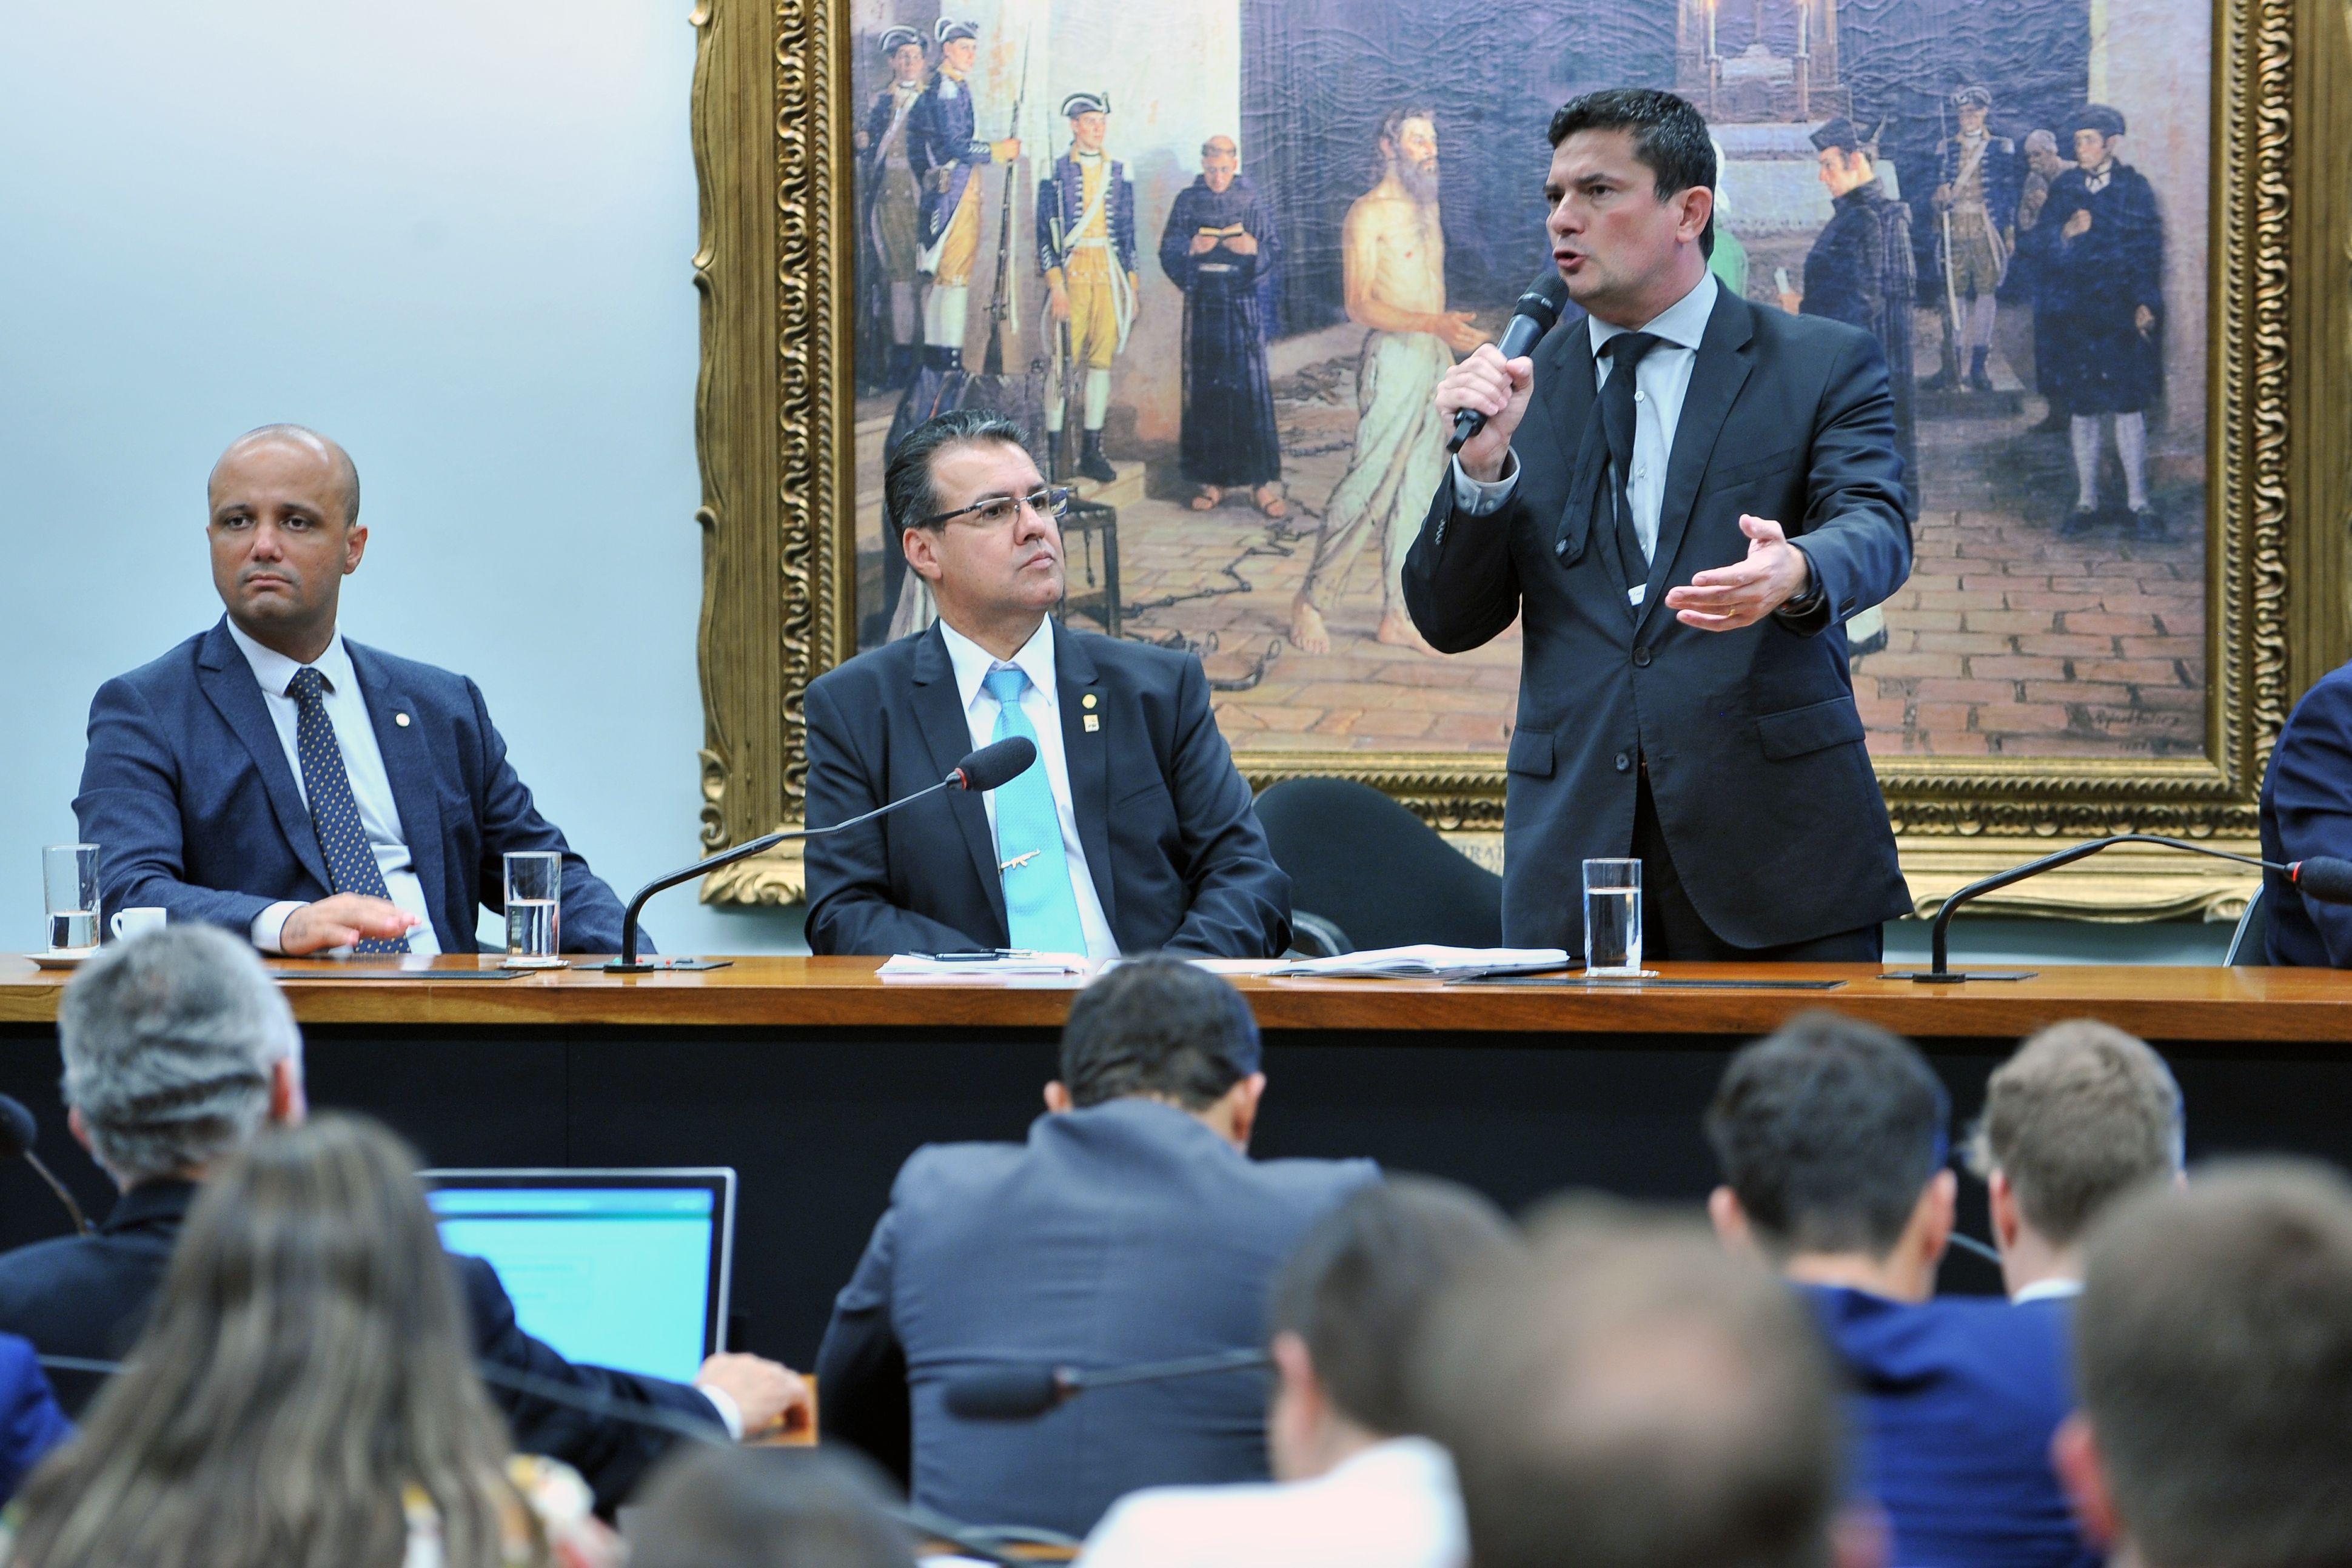 Ministro Sérgio Moro Moro detalha proposta de lei anticrime a deputados: ´O crime organizado faz pagamento de vantagem indevida para buscar impunidade´